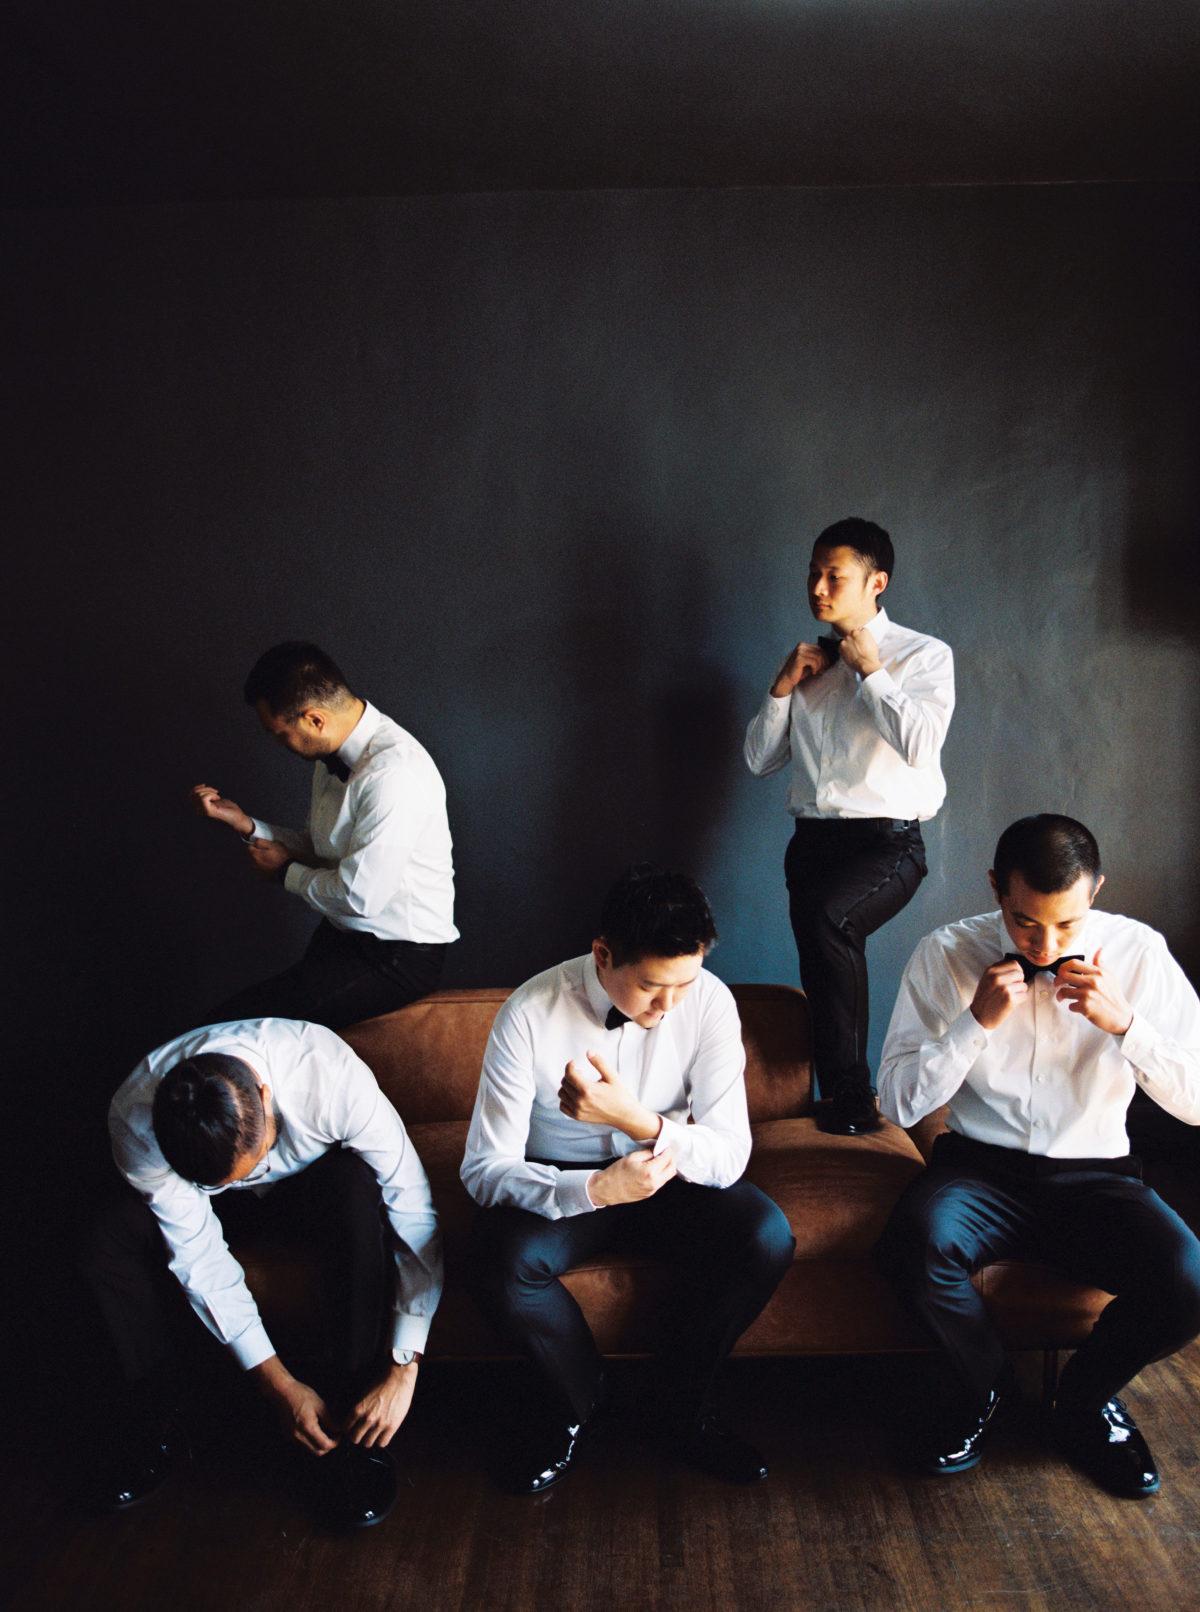 groomsmen wearing suits